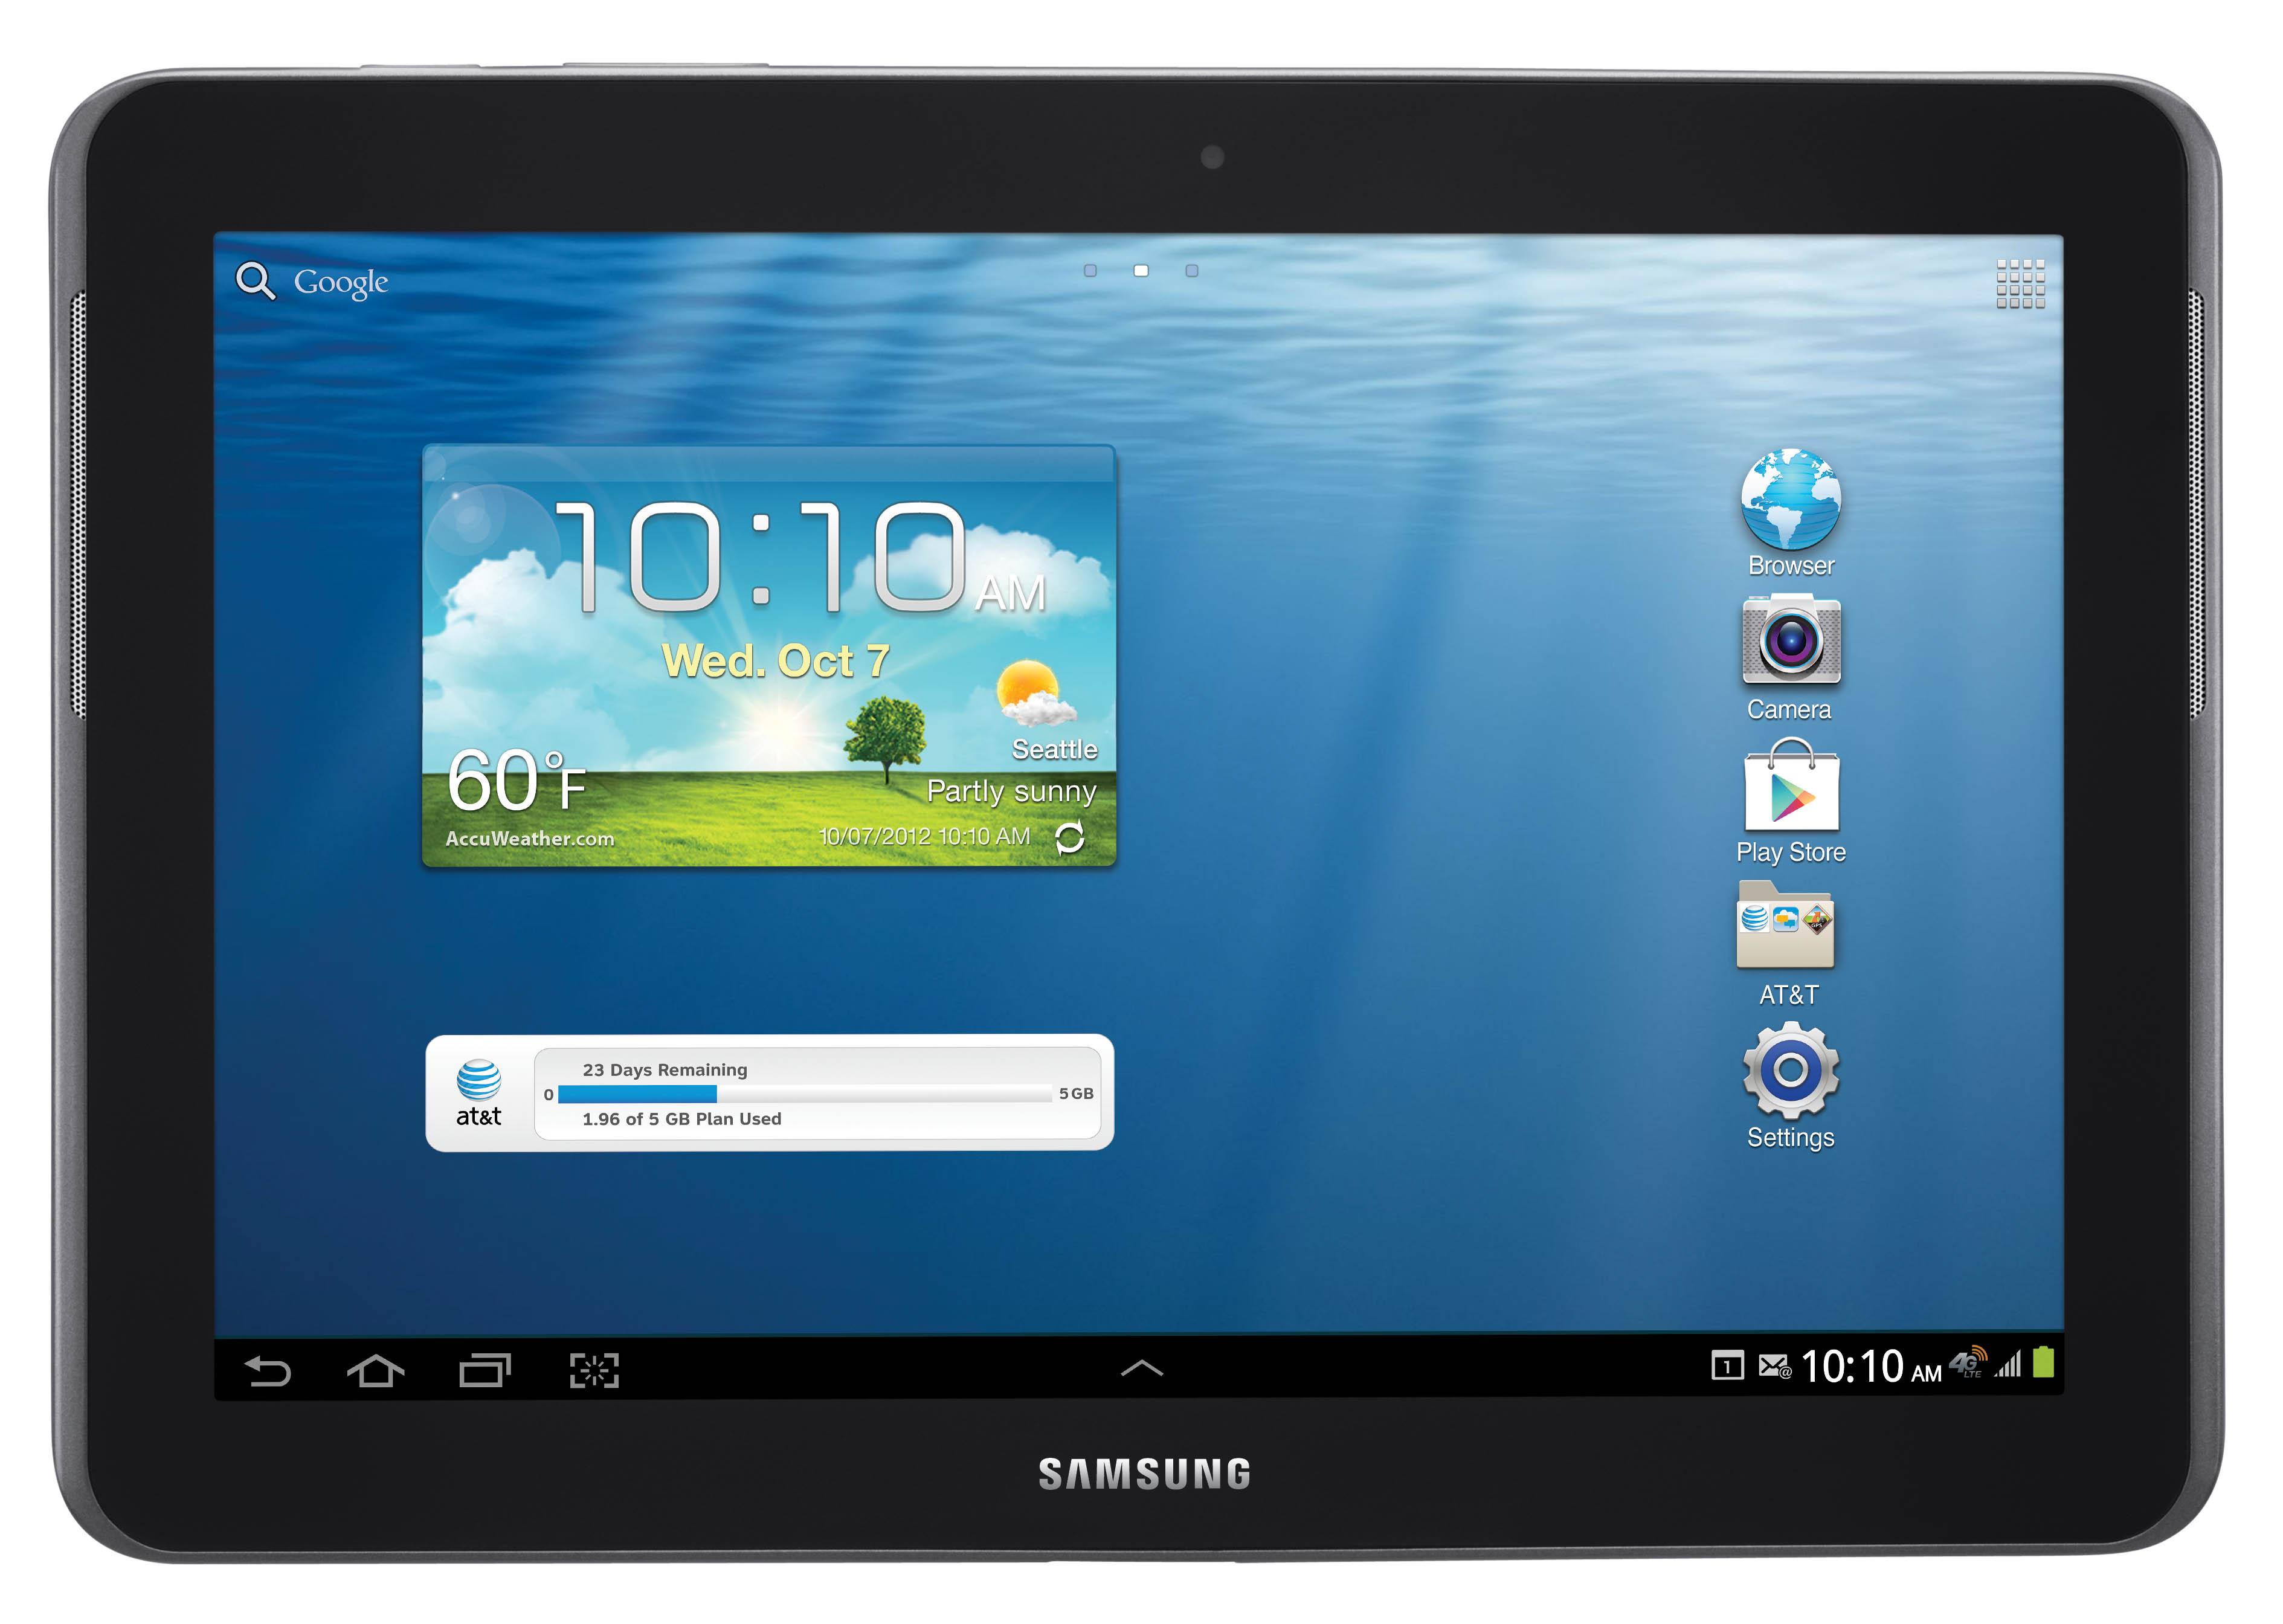 Samsung Tablet   Pictures Pics Photos Images Wallpapers Desktop 3779x2688